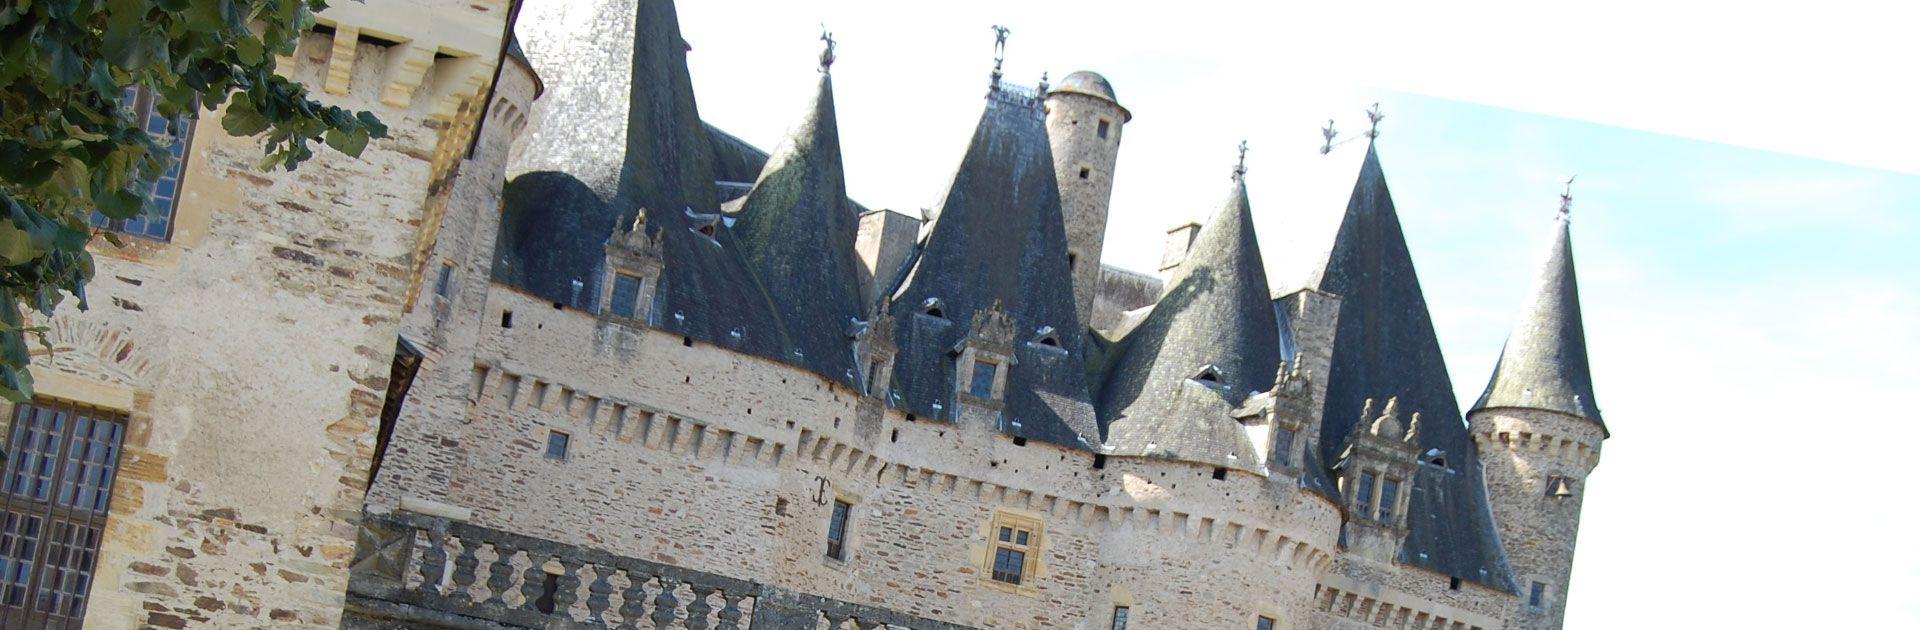 Château de Jumilhac Or Jardins Périgord Vert